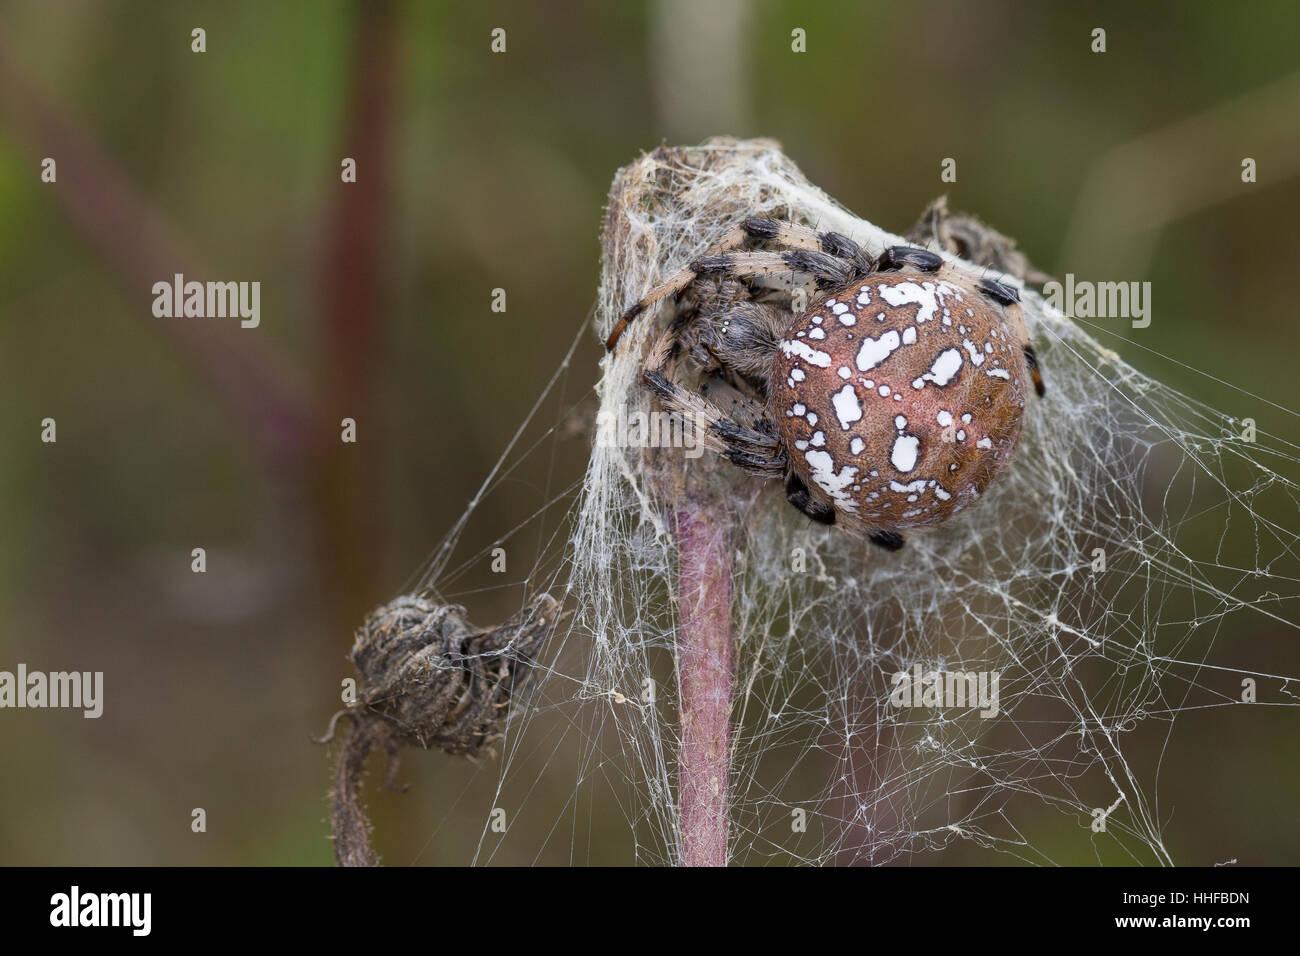 Vierfleck-Kreuzspinne, Vierfleckkreuzspinne, Weibchen, Kreuzspinne, Araneus quadratus, fourspotted orbweaver, female, - Stock Image